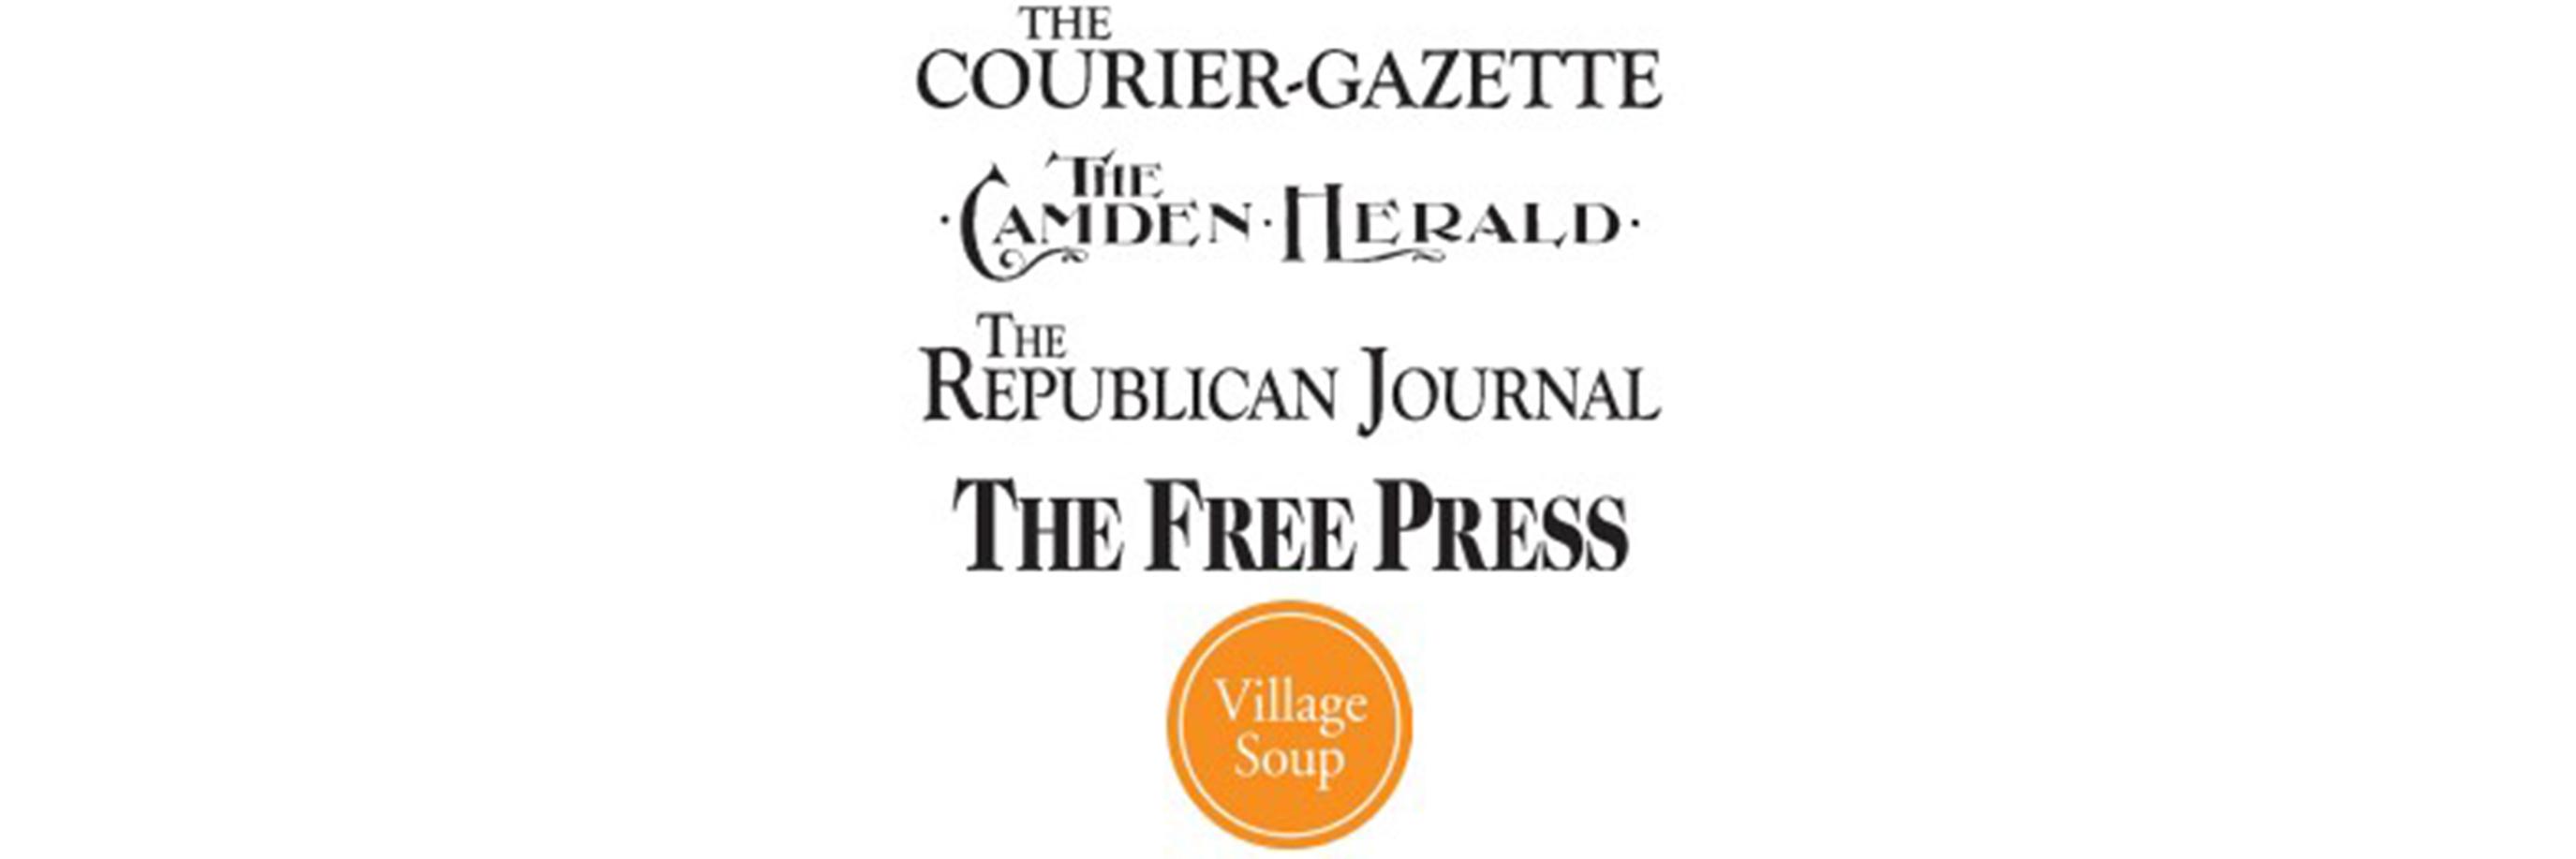 Courier-Gazette